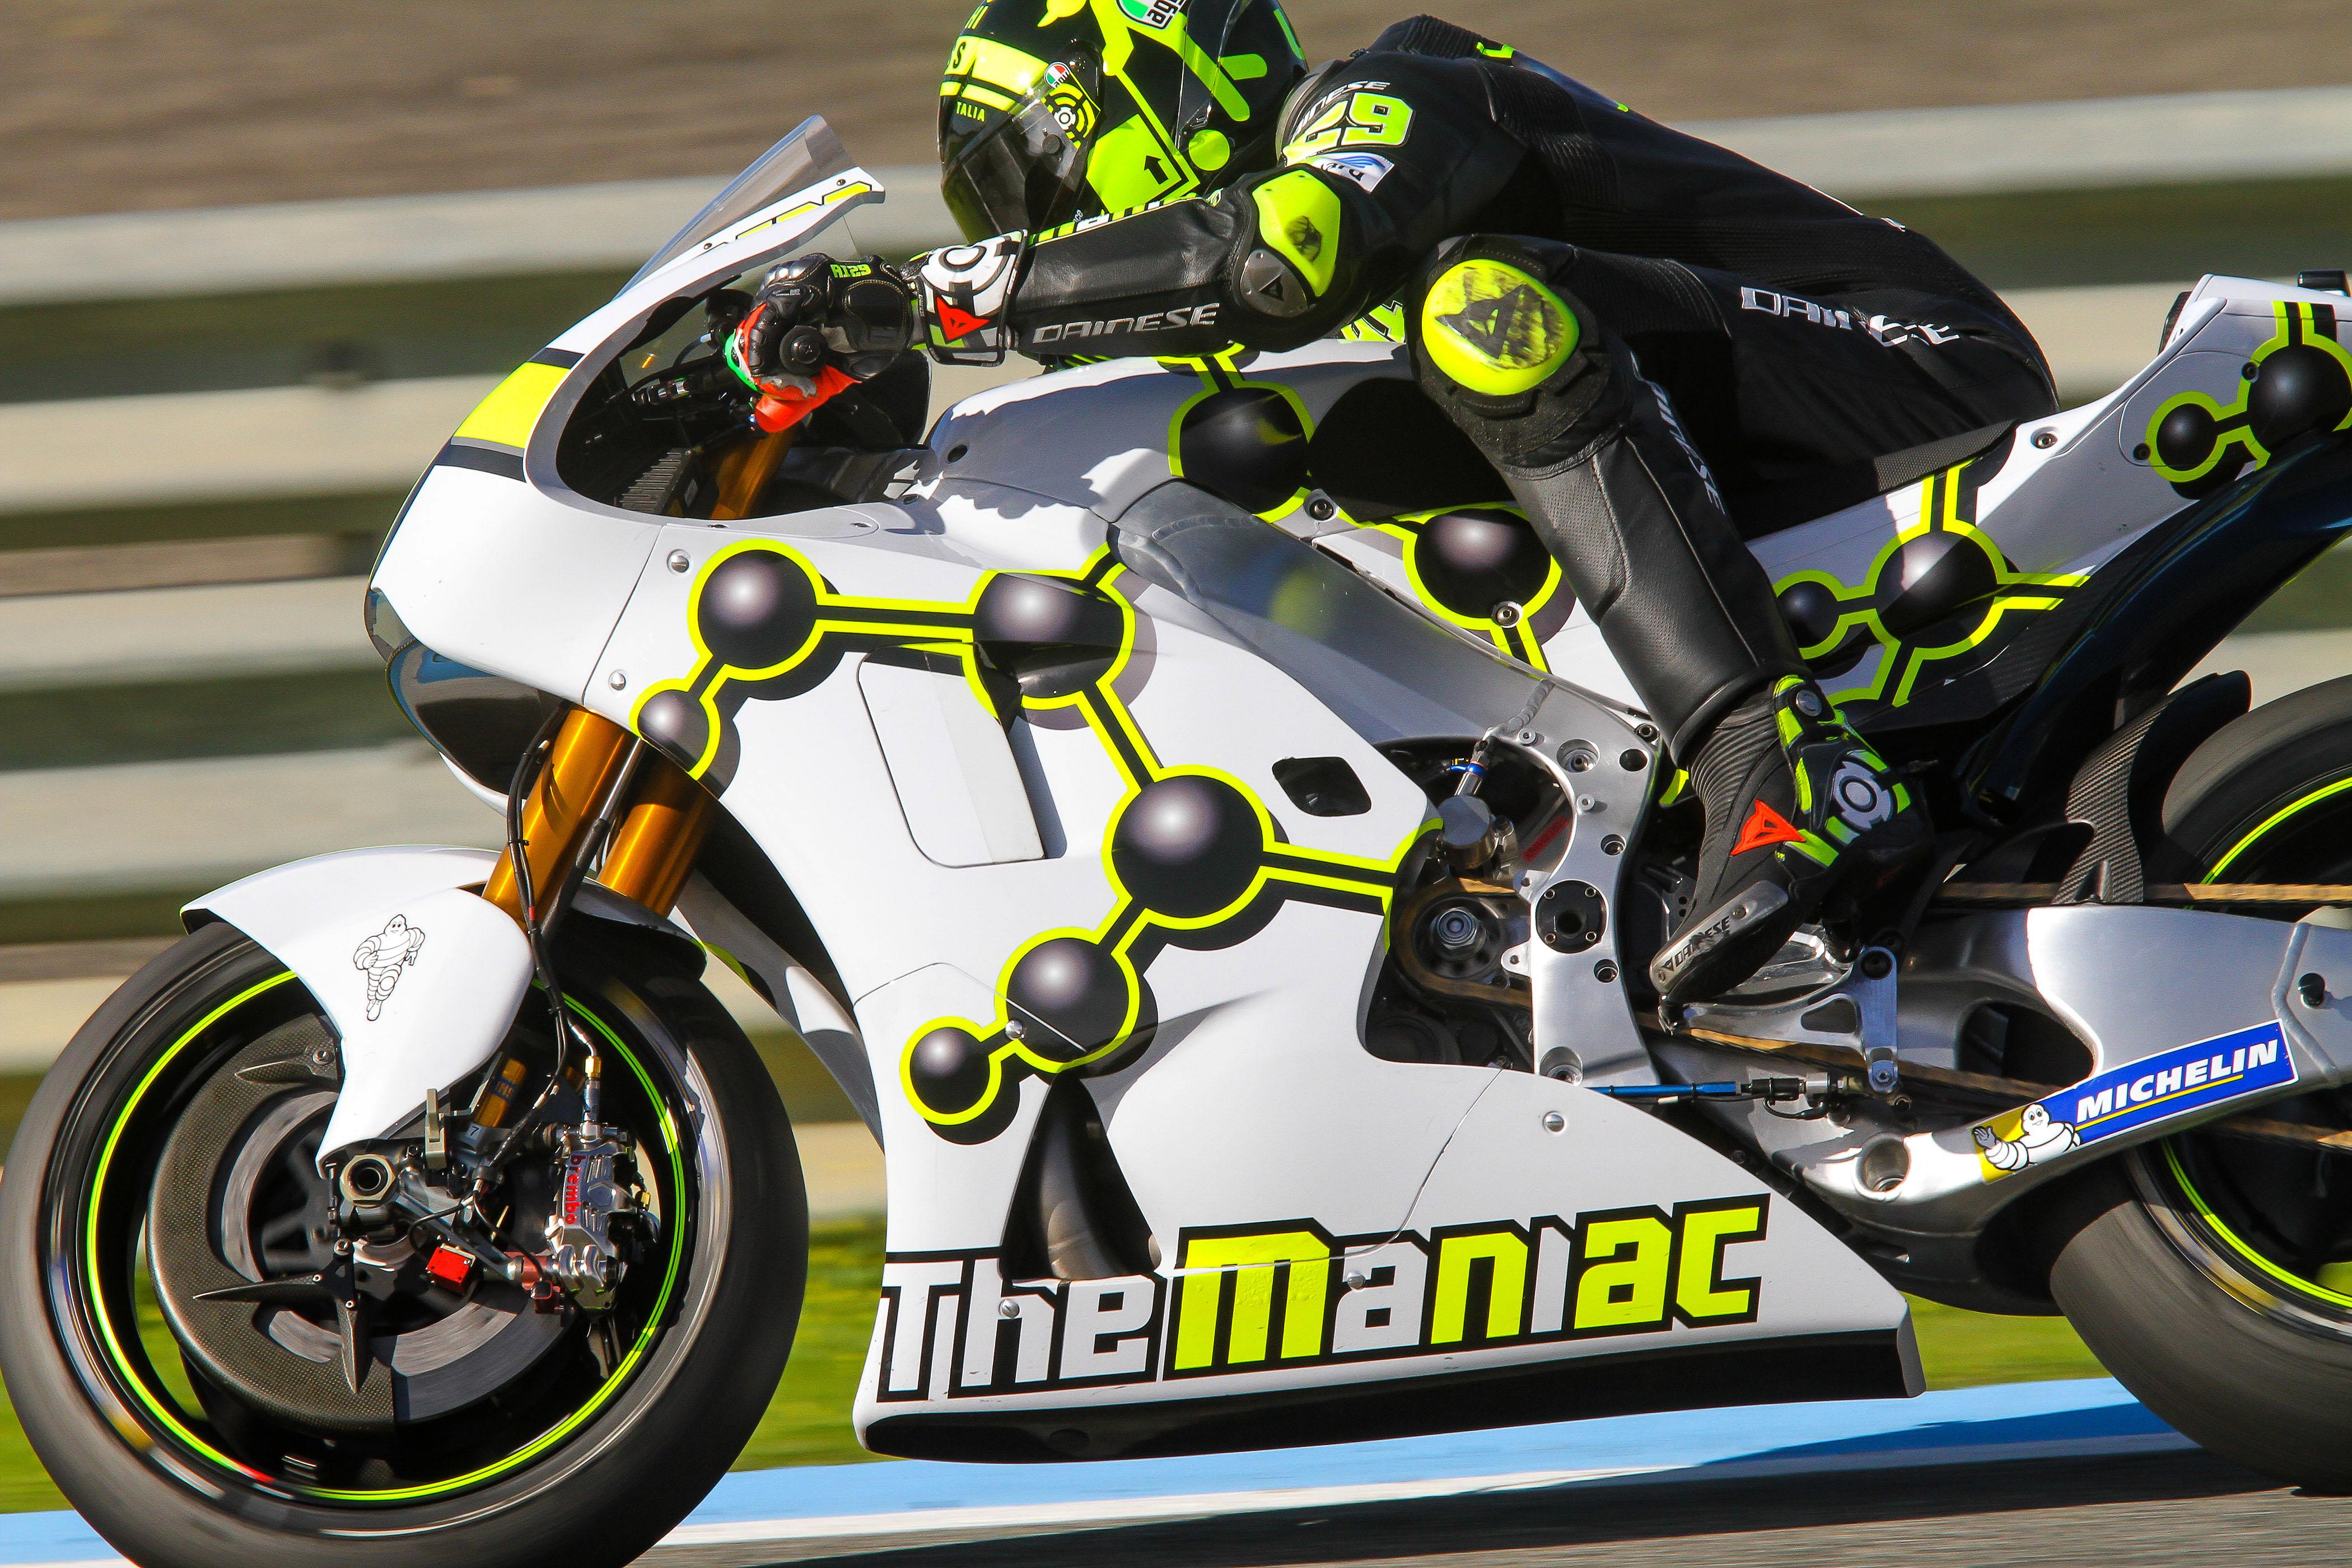 Andrea Iannone Suzuki Jerez MotoGP testing 2016